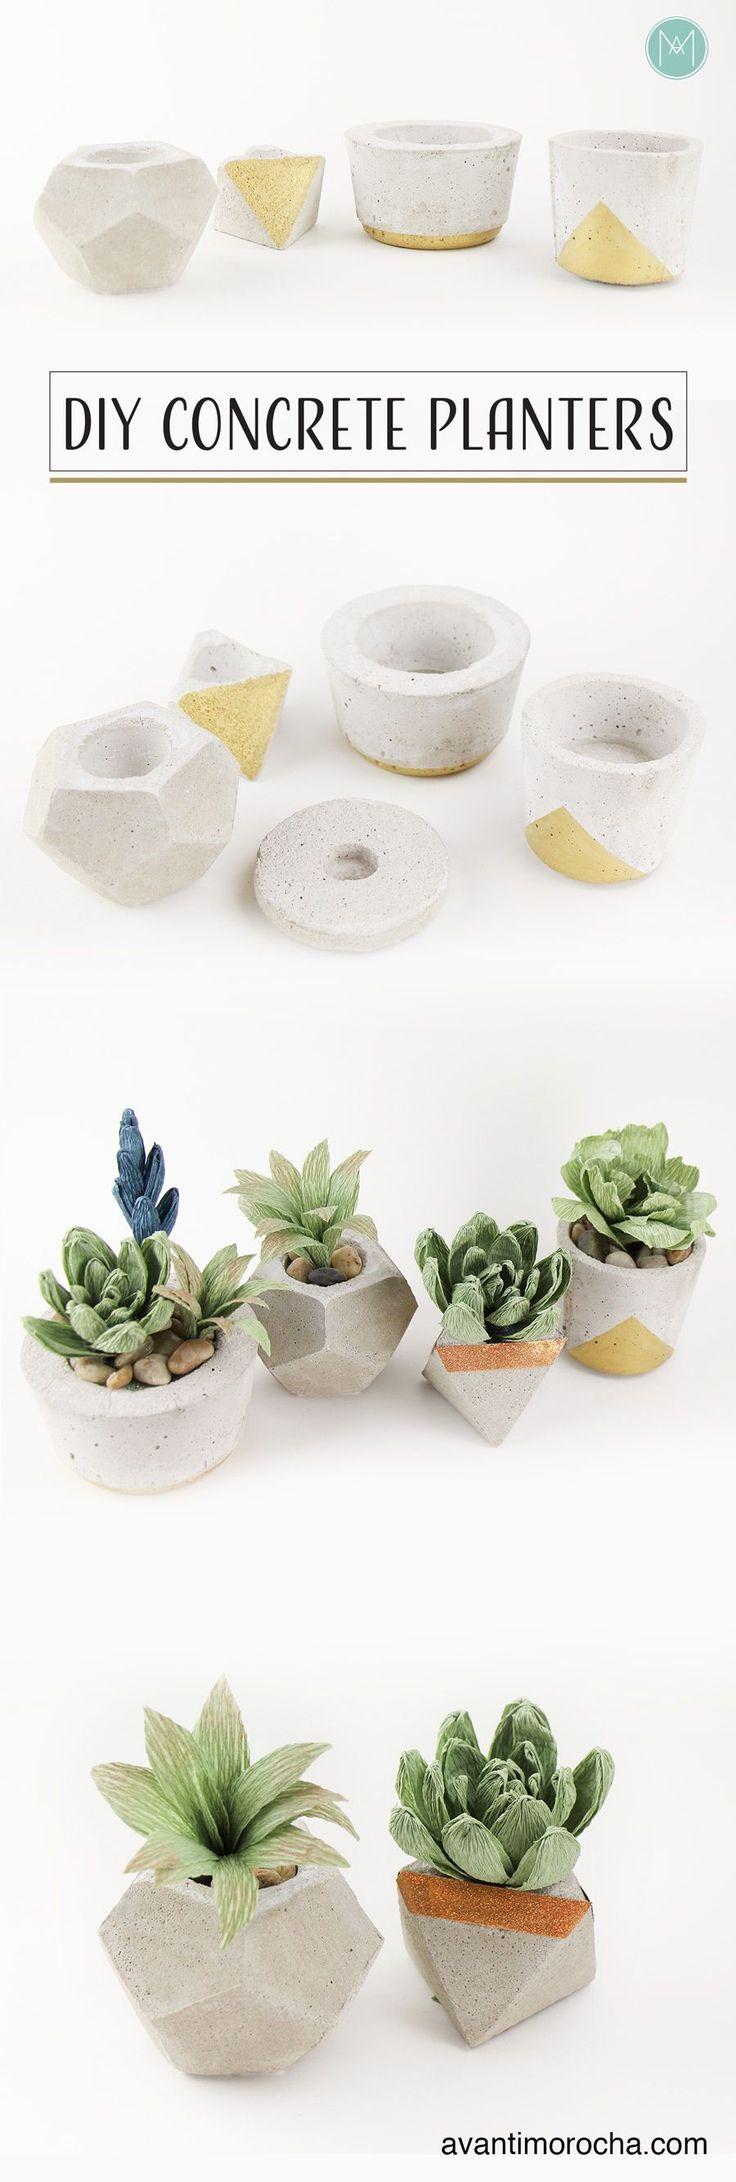 DIY Concrete Planters - Macetas de Concreto / Wedding Favors / Home-decor